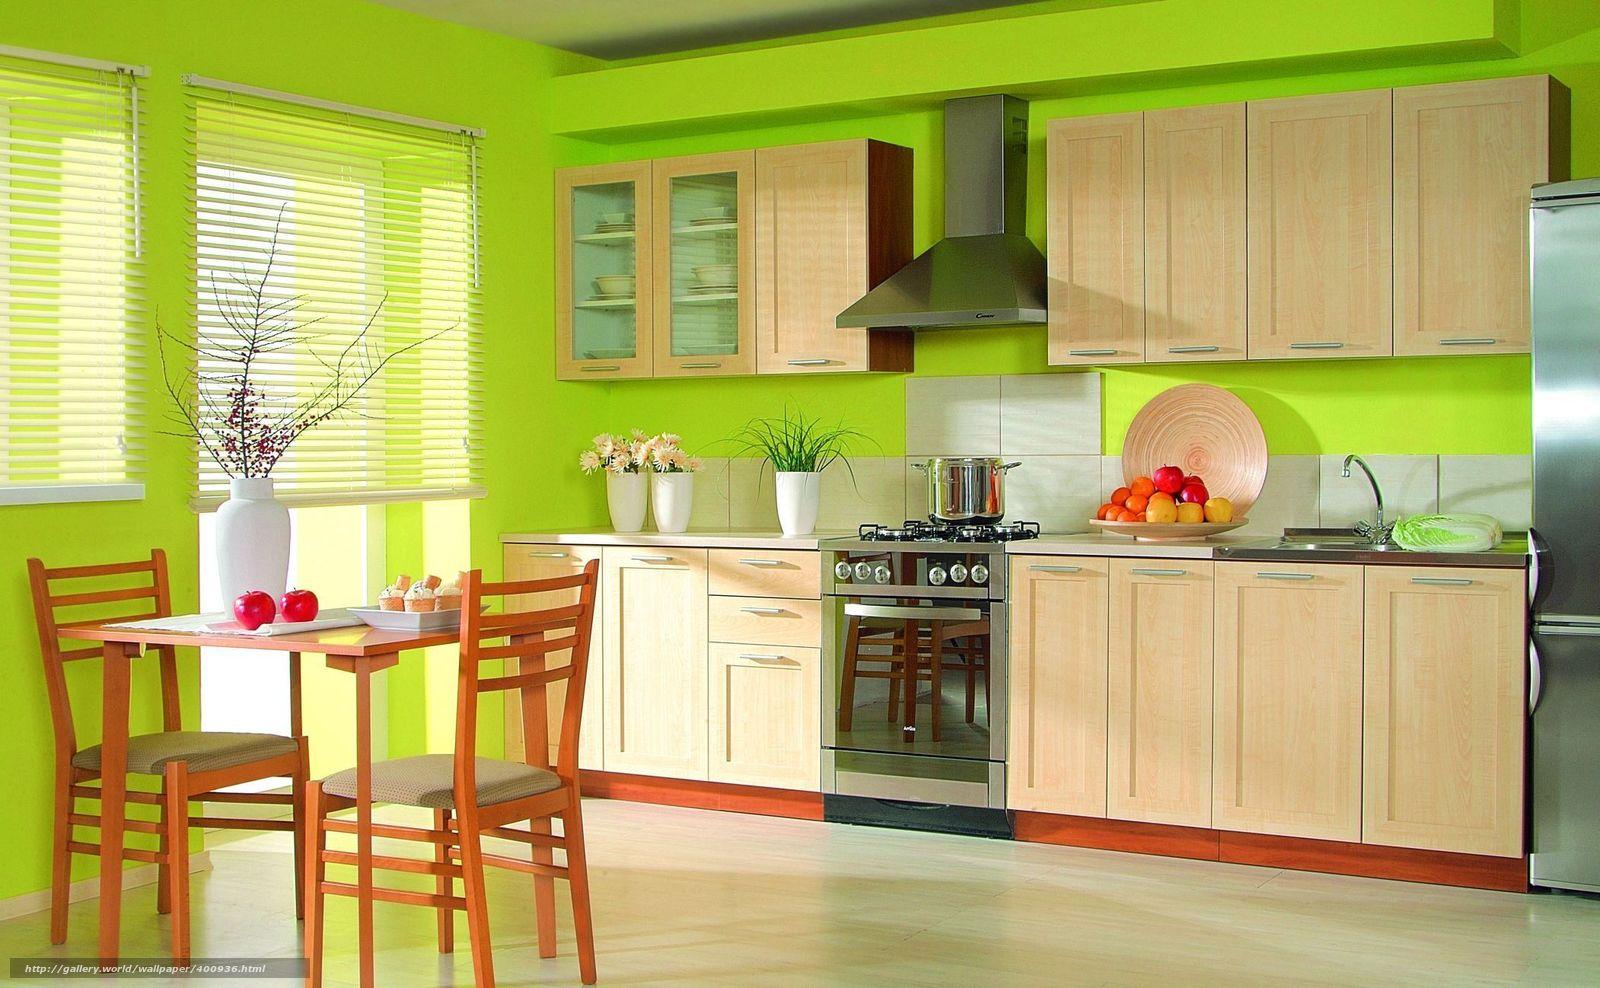 meuble cuisine vert fixation murale meuble cuisine cuisine fixation murale meuble cuisine avec. Black Bedroom Furniture Sets. Home Design Ideas